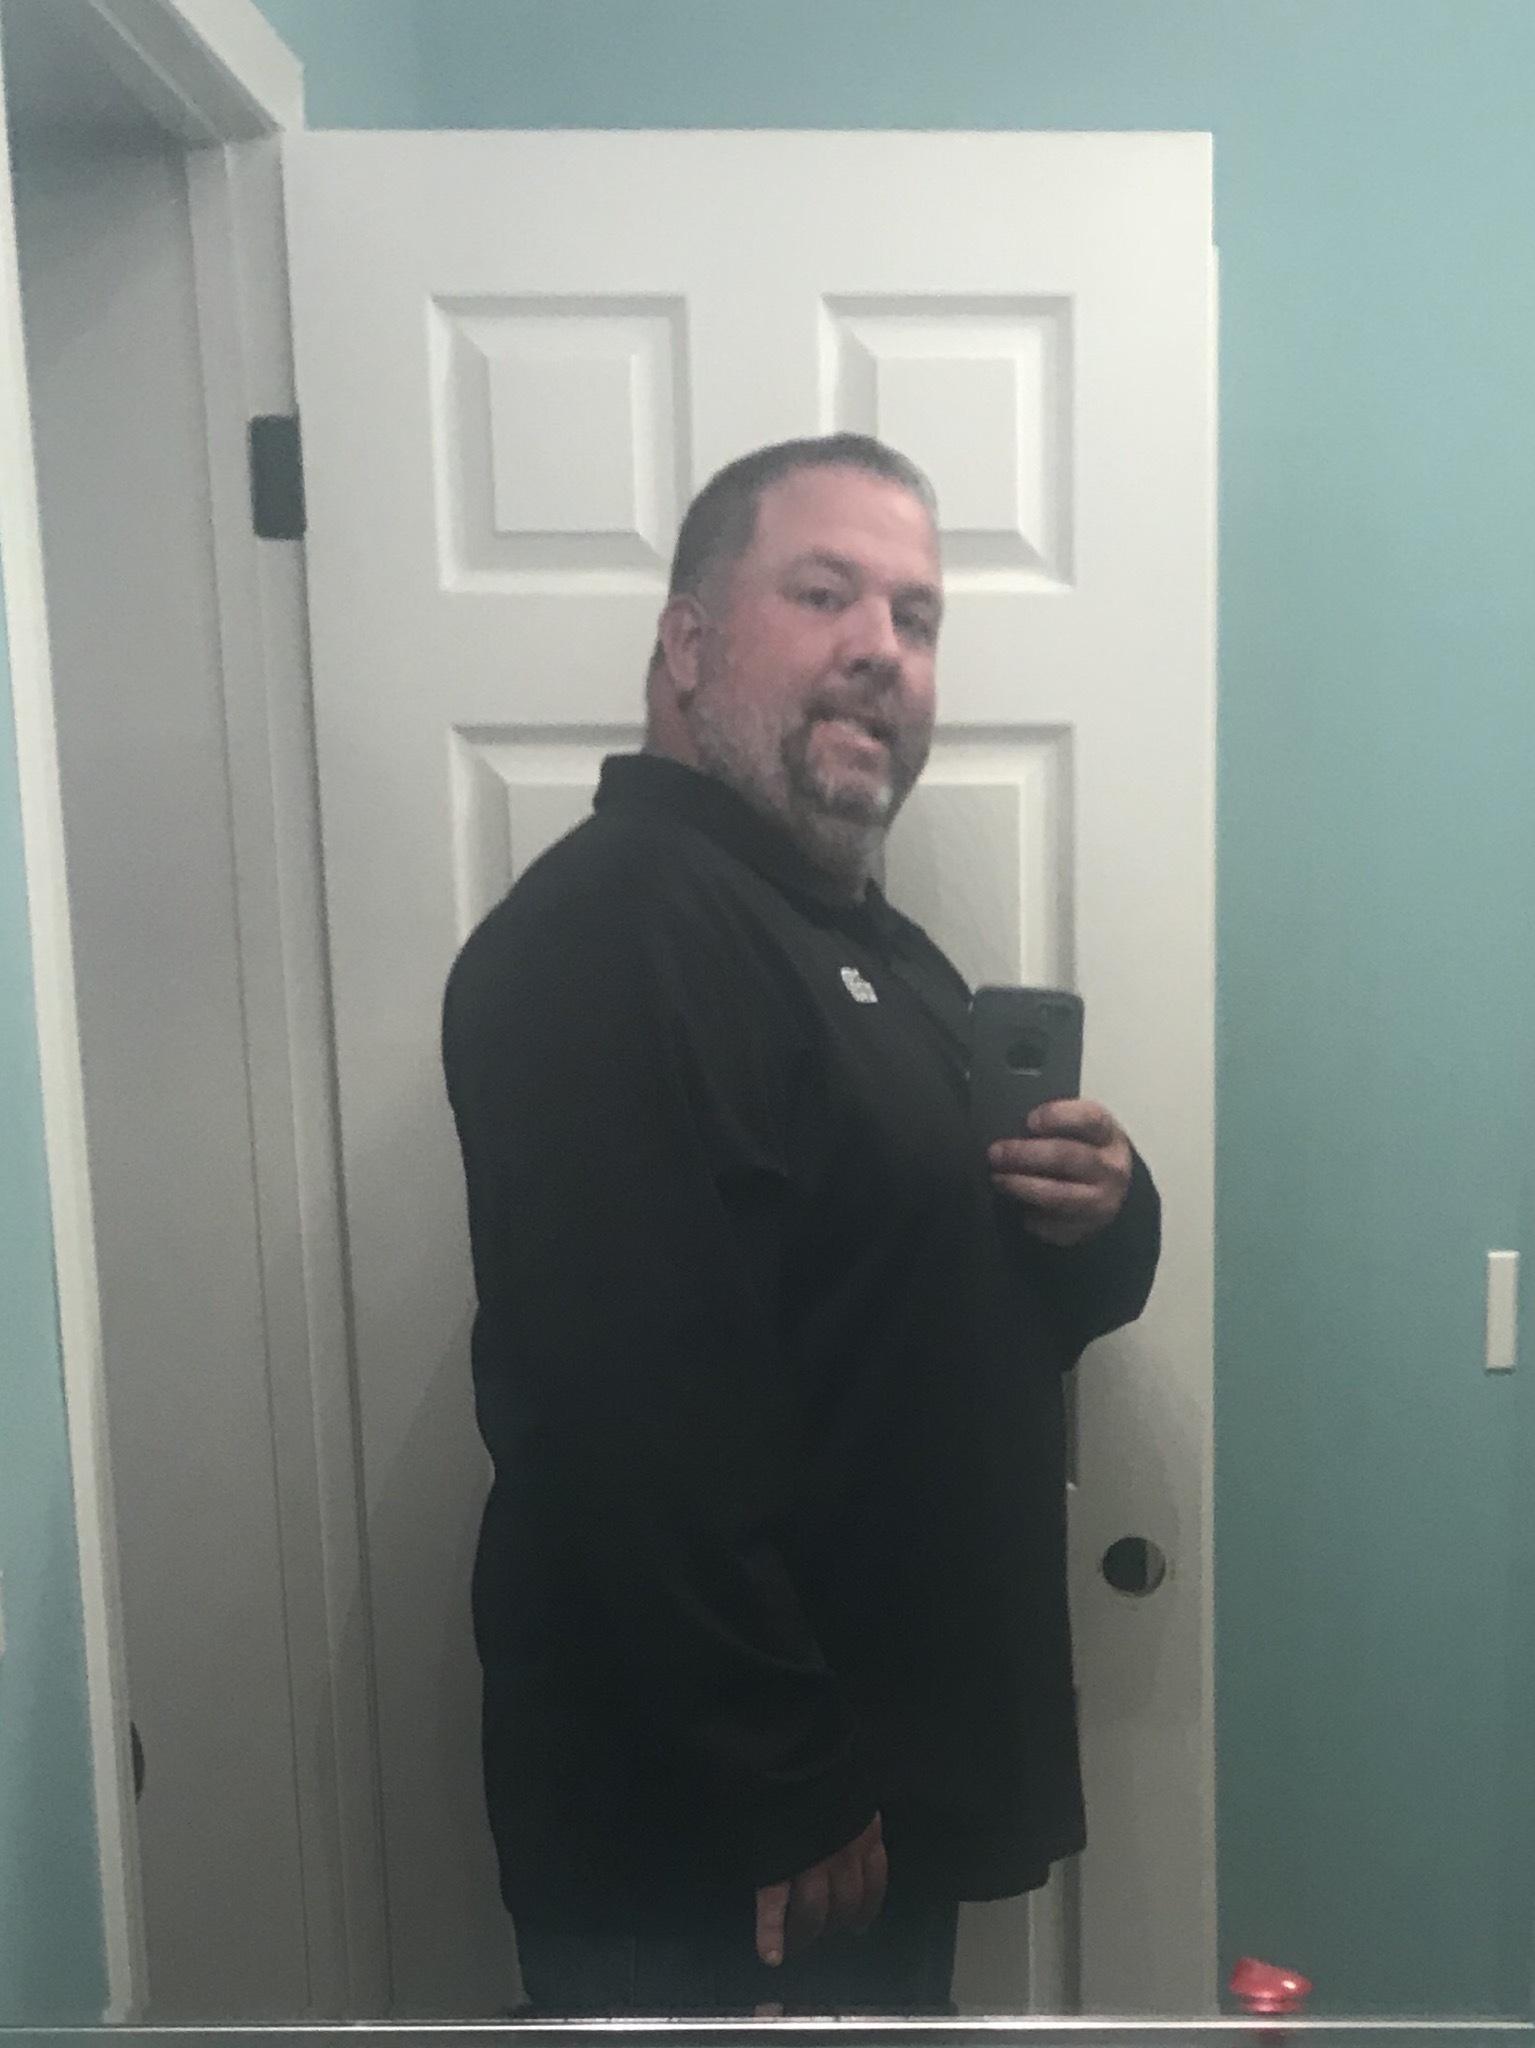 SugarDaddy profile Gwhite418